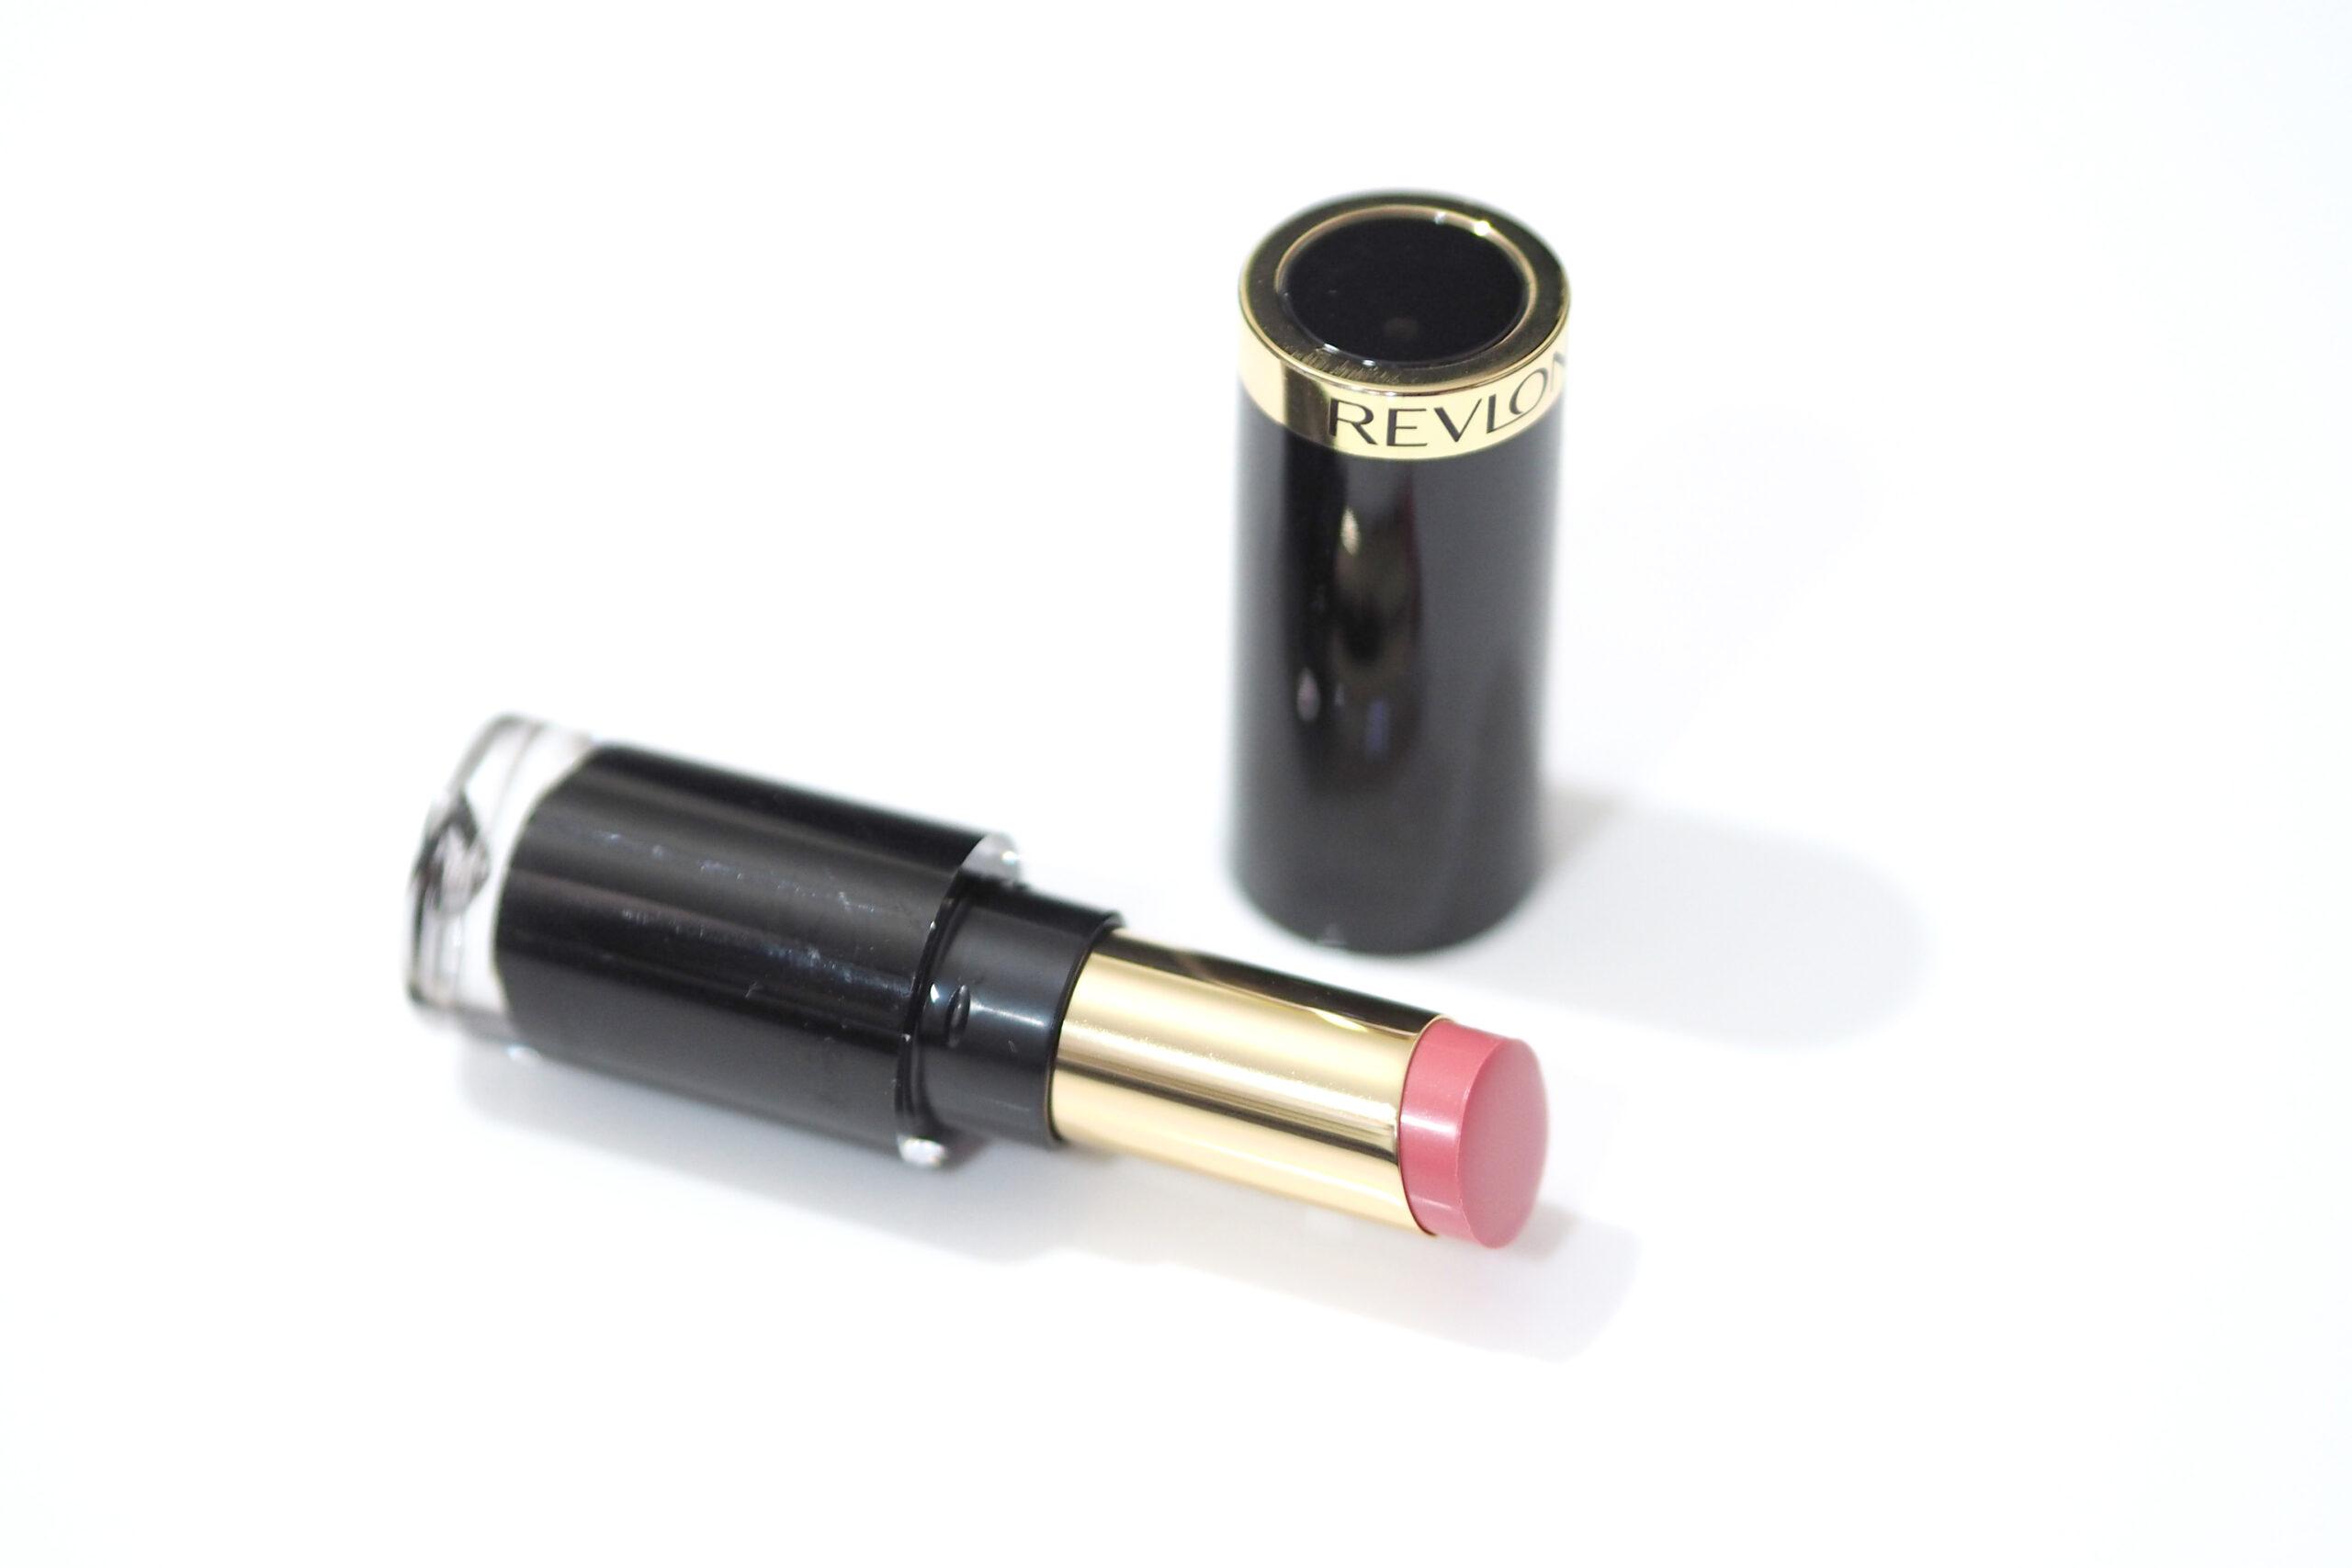 Revlon Super Lustrous Glass Shine Lipstick Review / Swatches